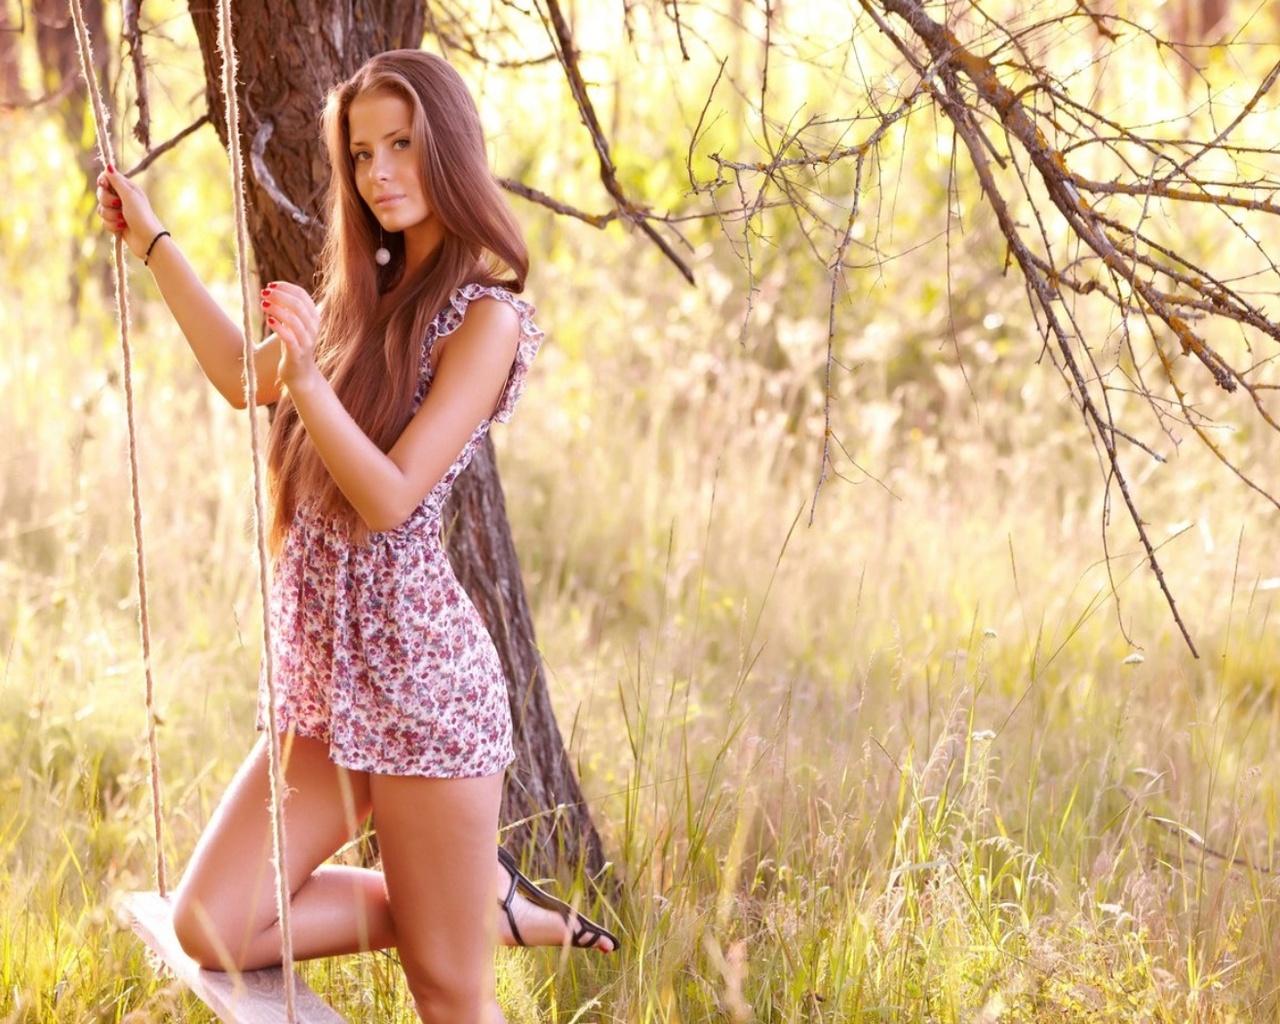 Красивое фото девушек на природе весной